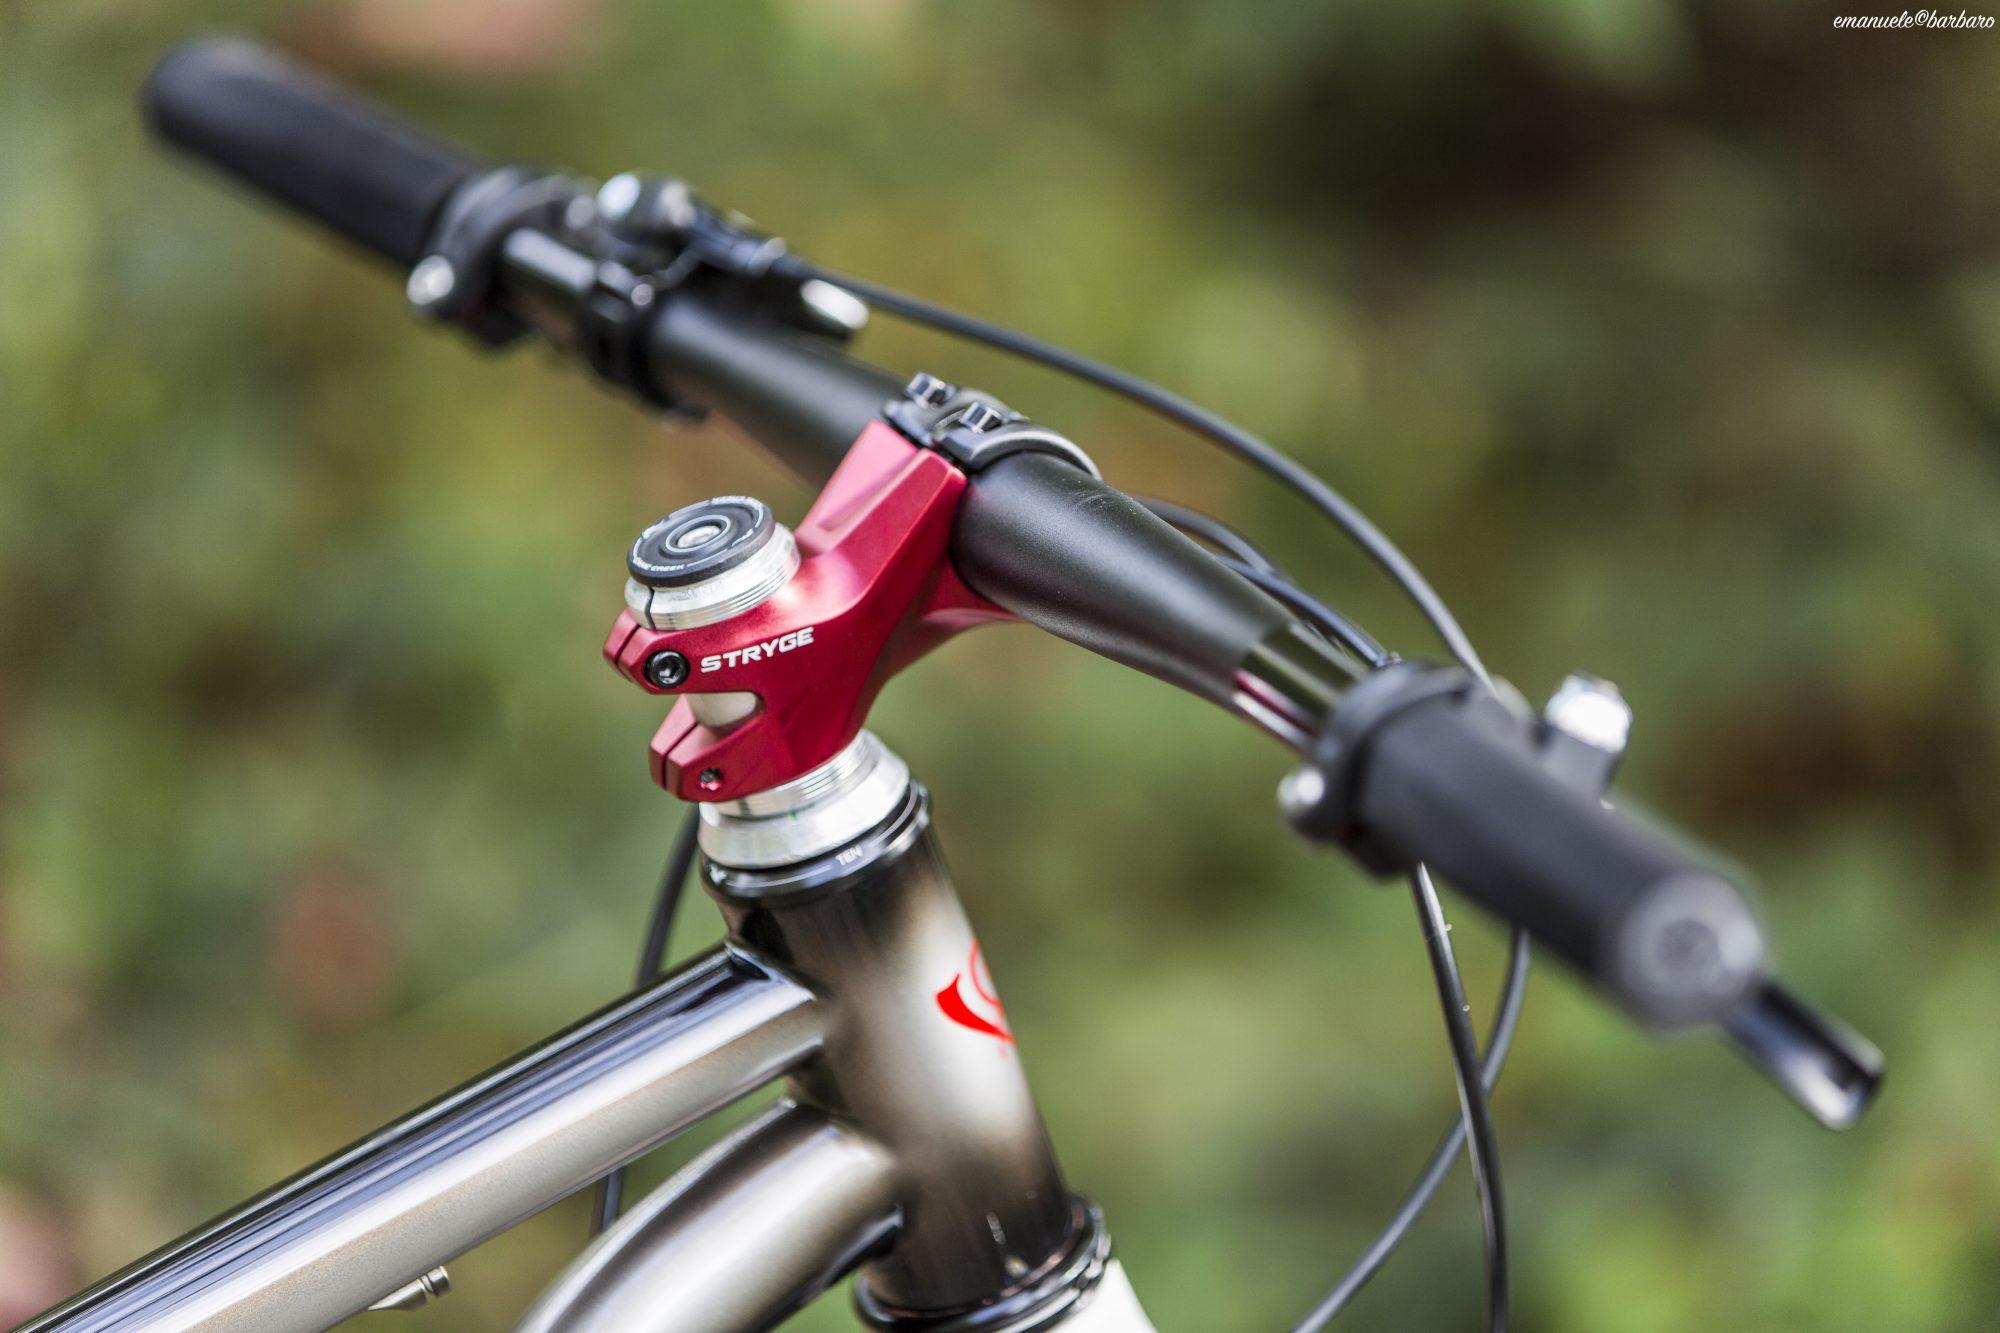 bice bicycles 29er endurello enduro hardtail bespoke handcrafted